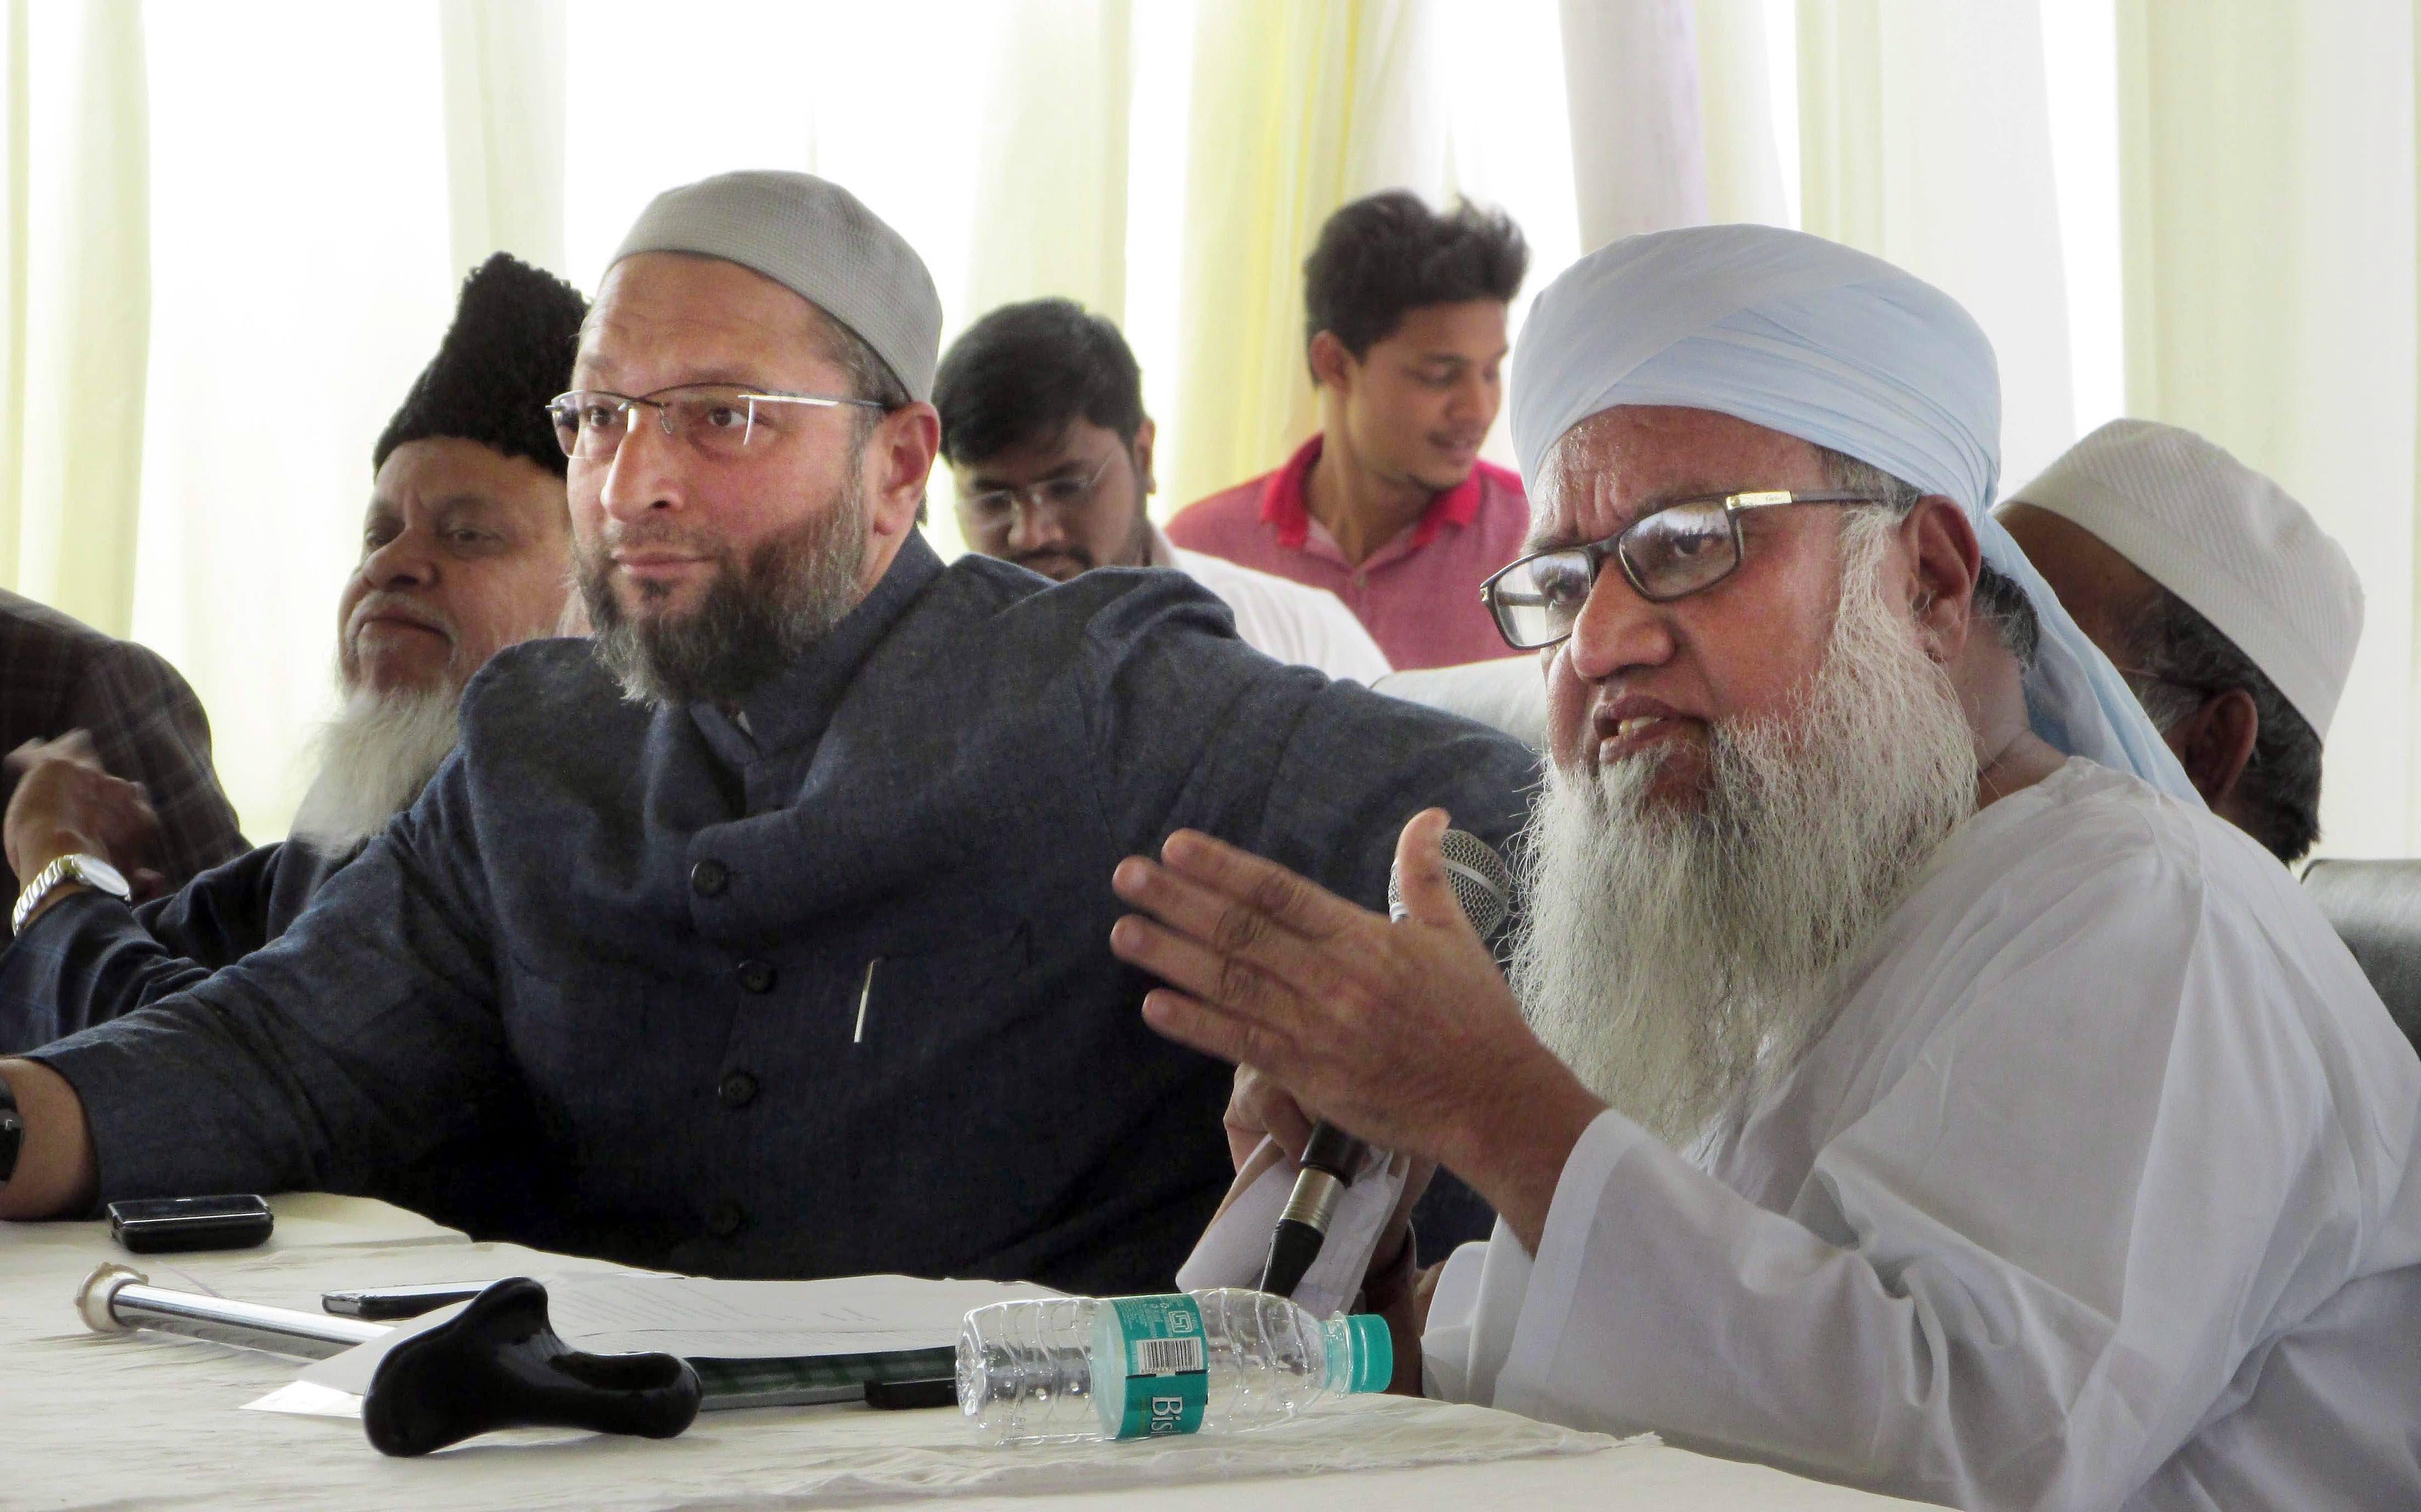 All India Muslim Personal Law Board spokesman Maulana Khalil-ur-Rehman Sajjad Nomani along with AIMIM president Asaduddin Owaisi addresses a press conference on 'triple talaq' in Hyderabad on Thursday. Credit: PTI